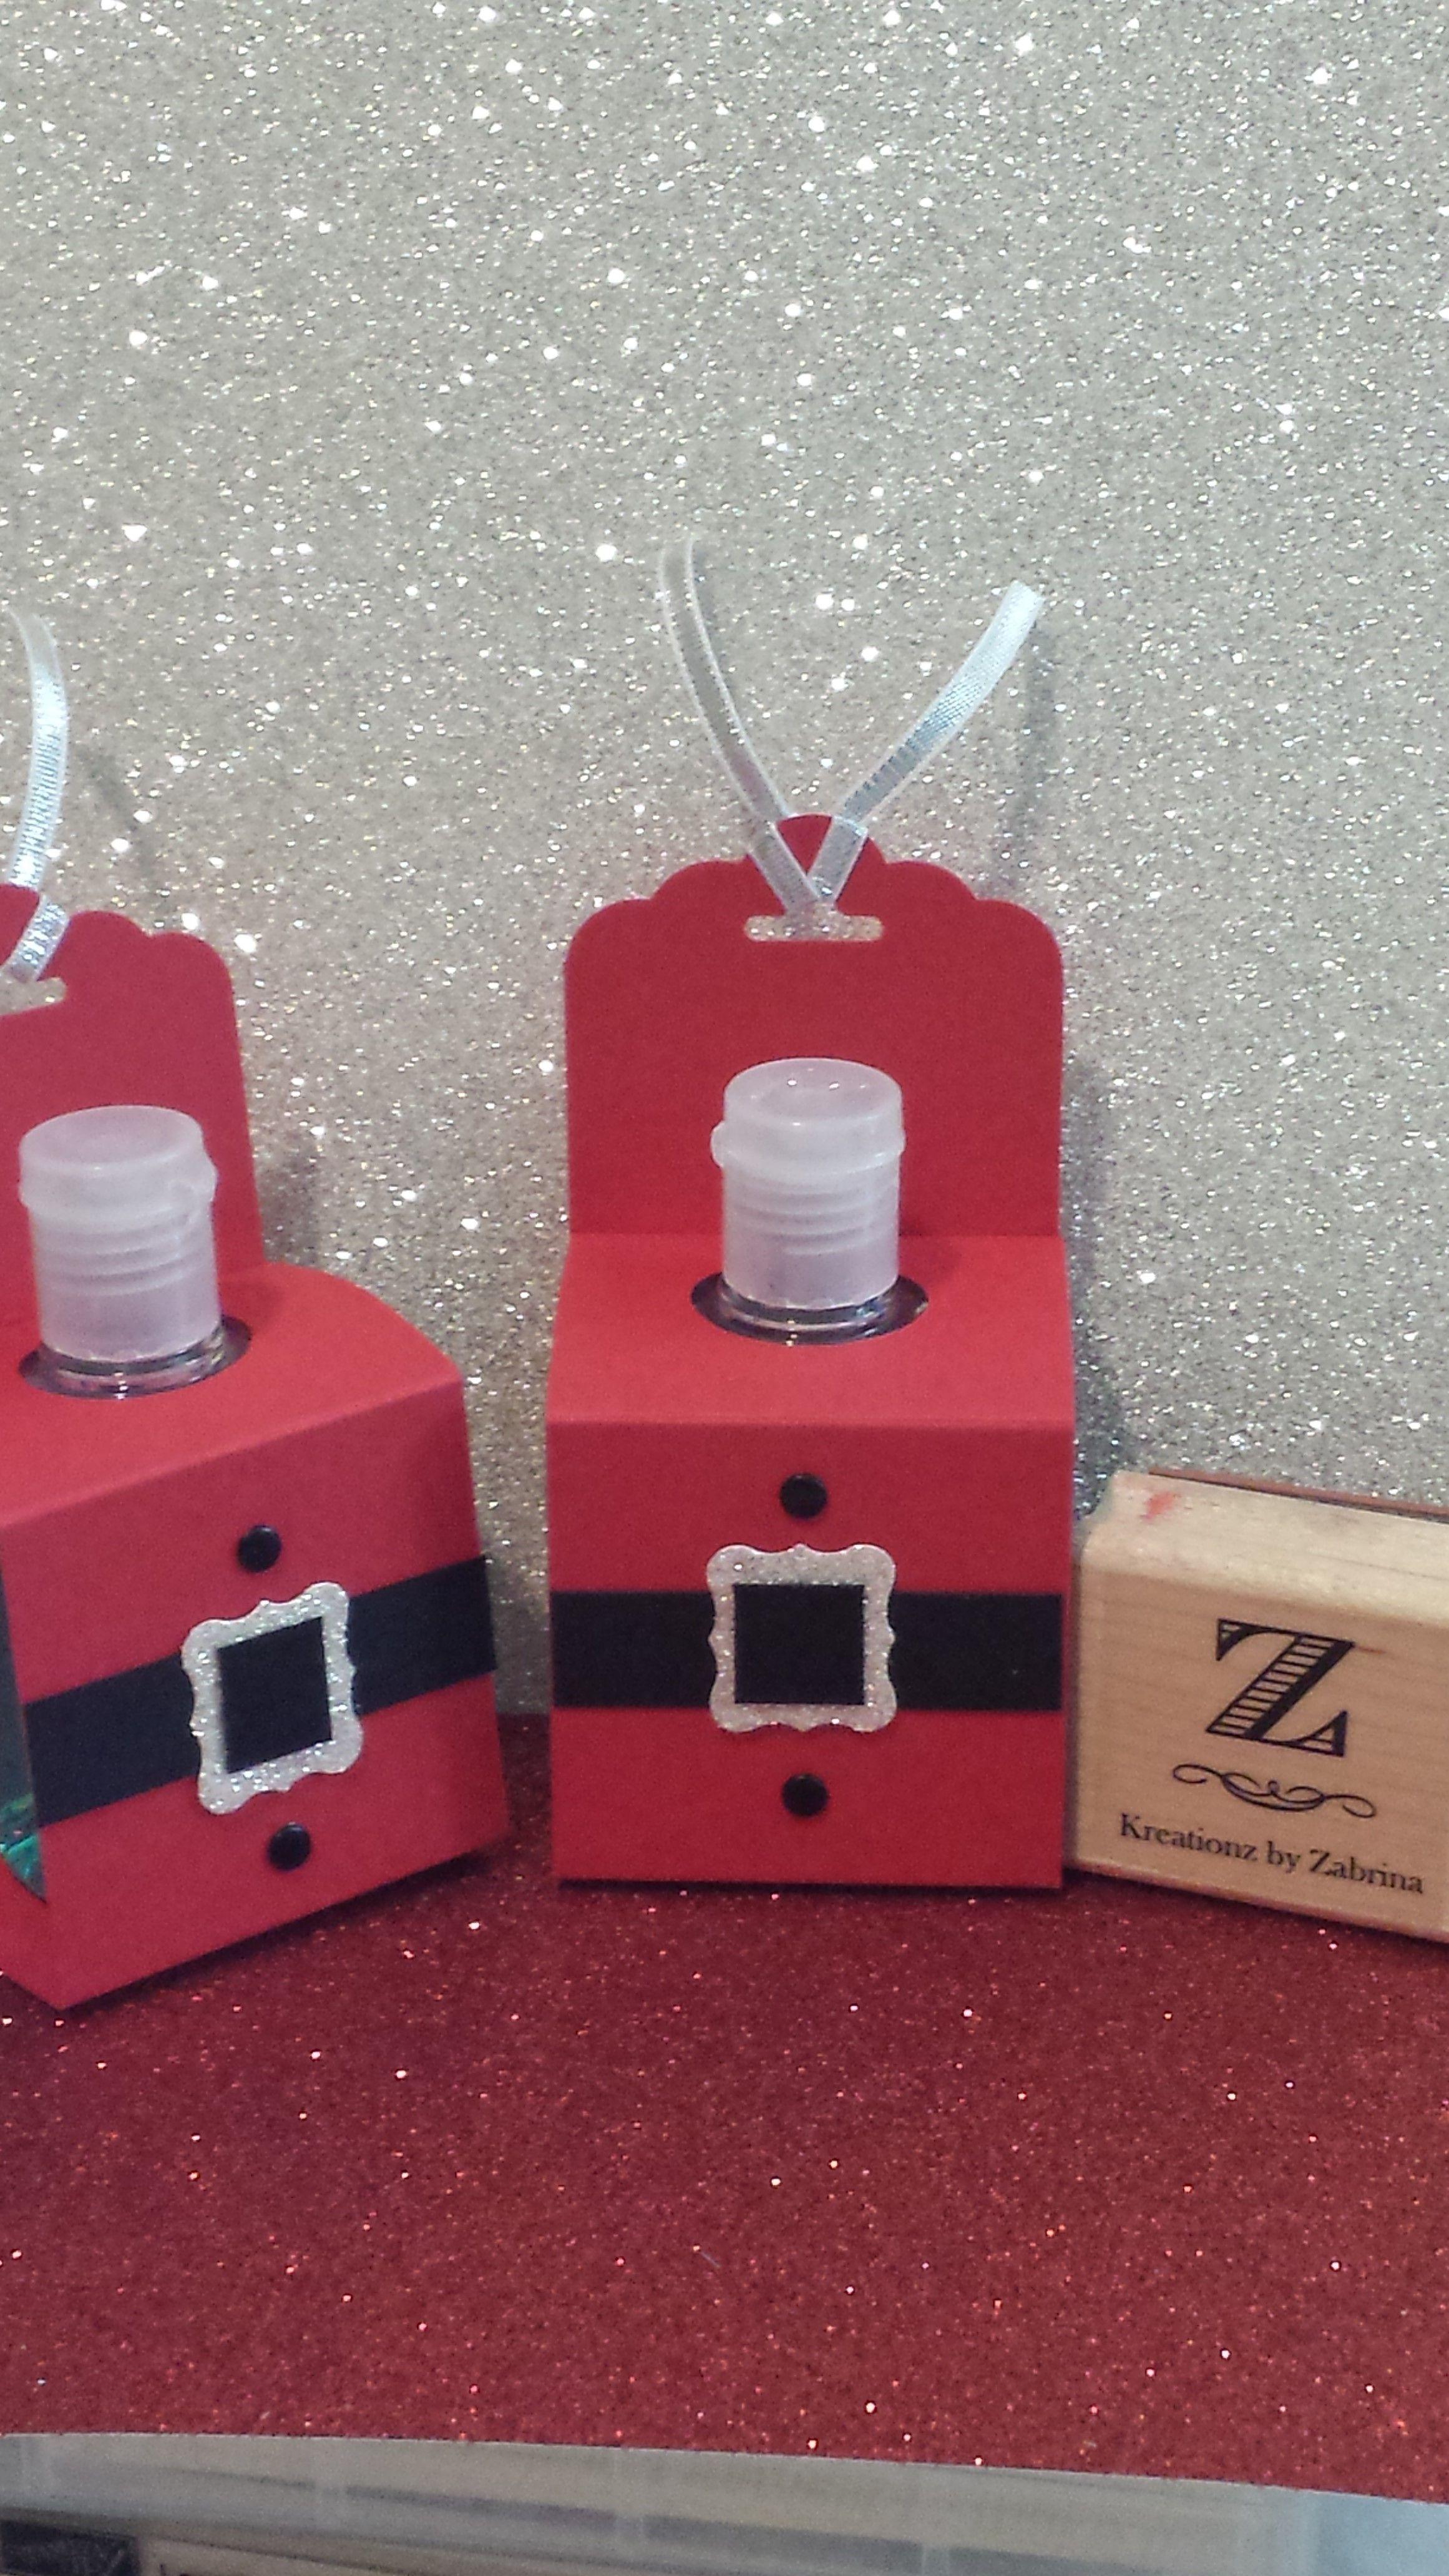 Santa Tizer Hand Sanitizer Covers Www Kreationzbyzabrina Com